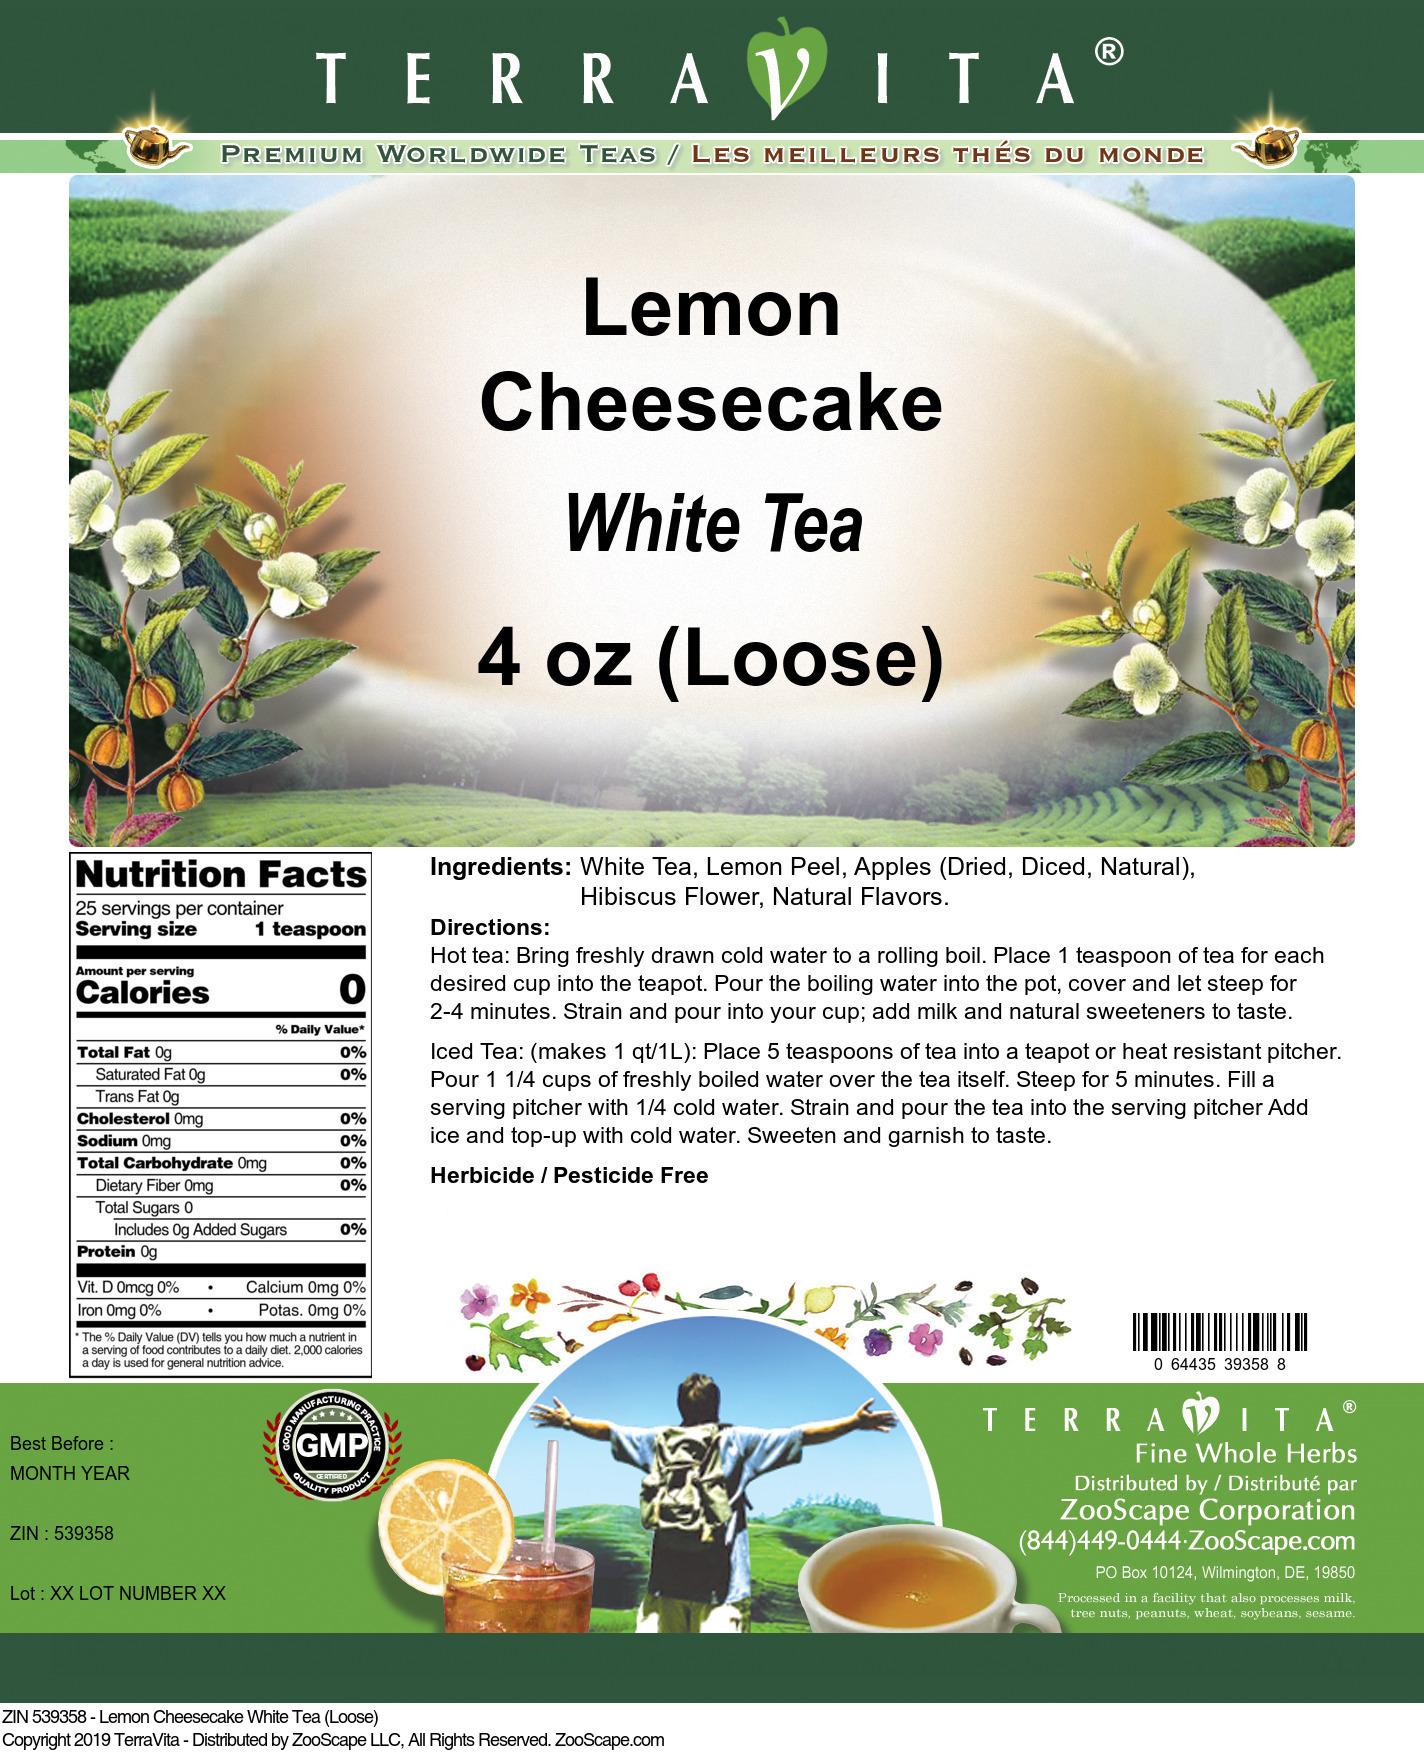 Lemon Cheesecake White Tea